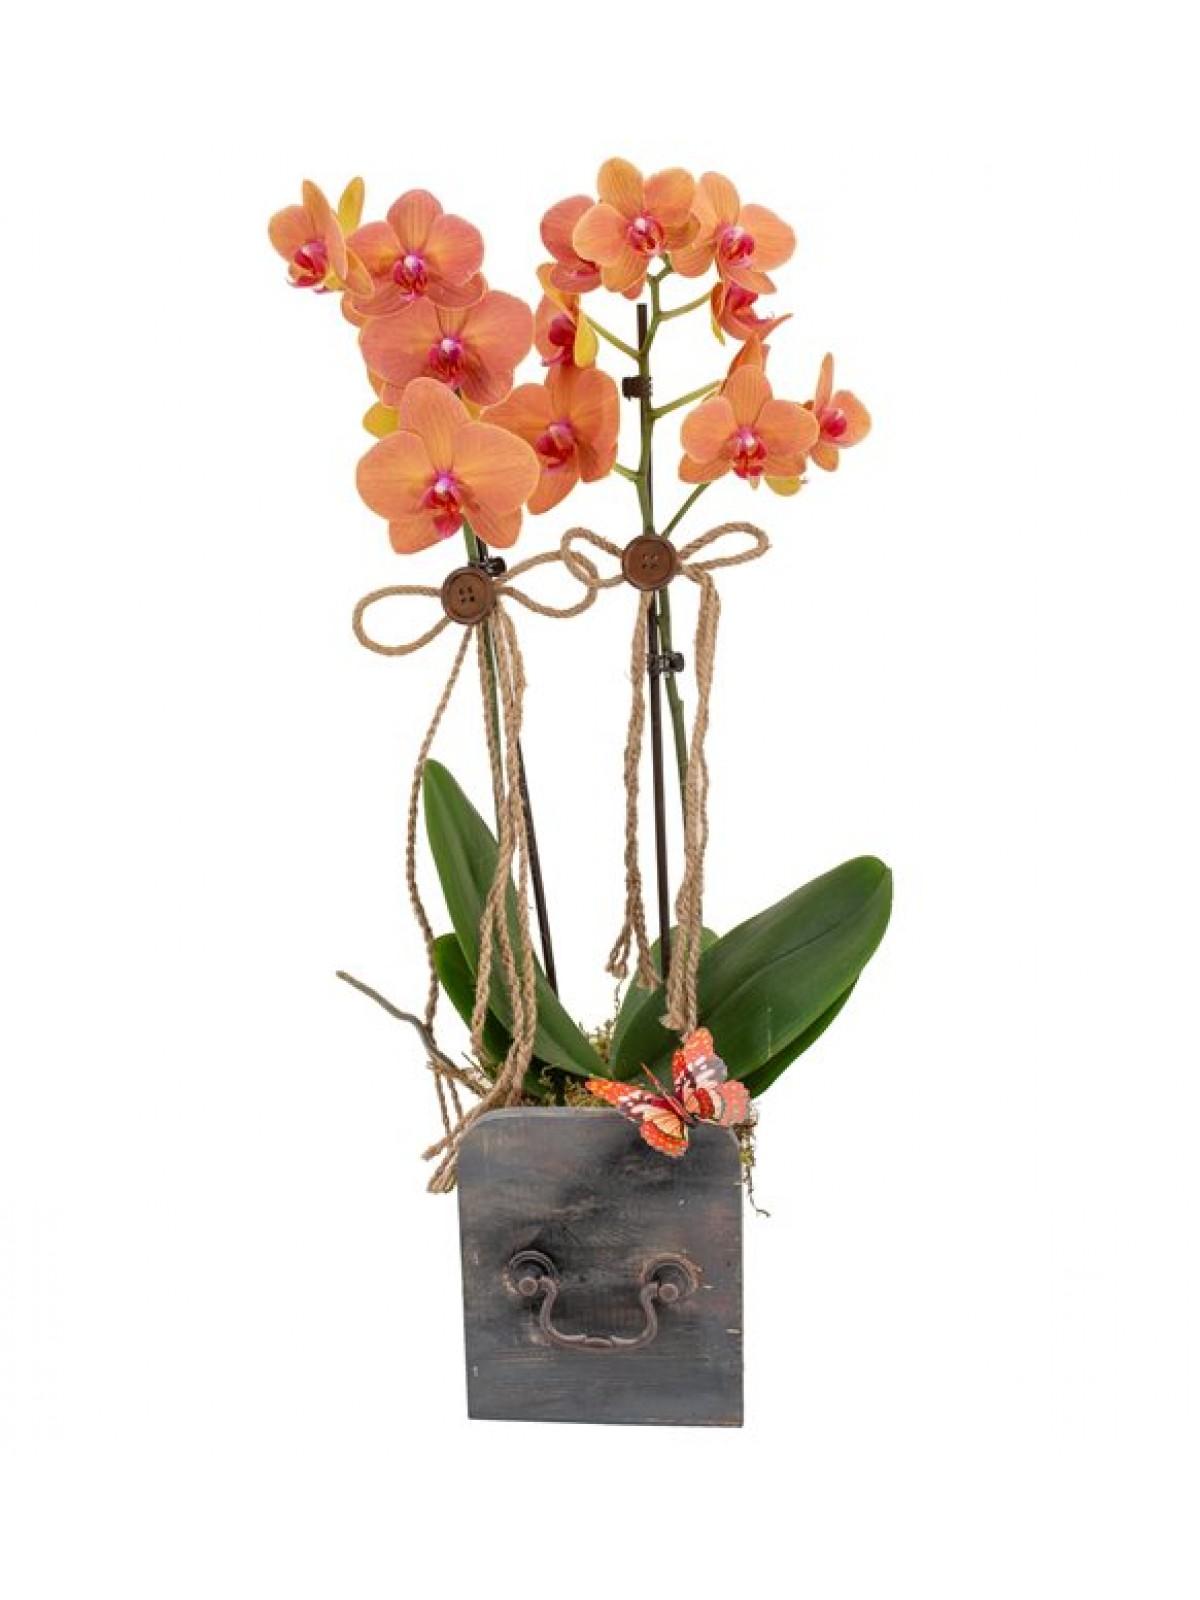 Orkide orange and Grey